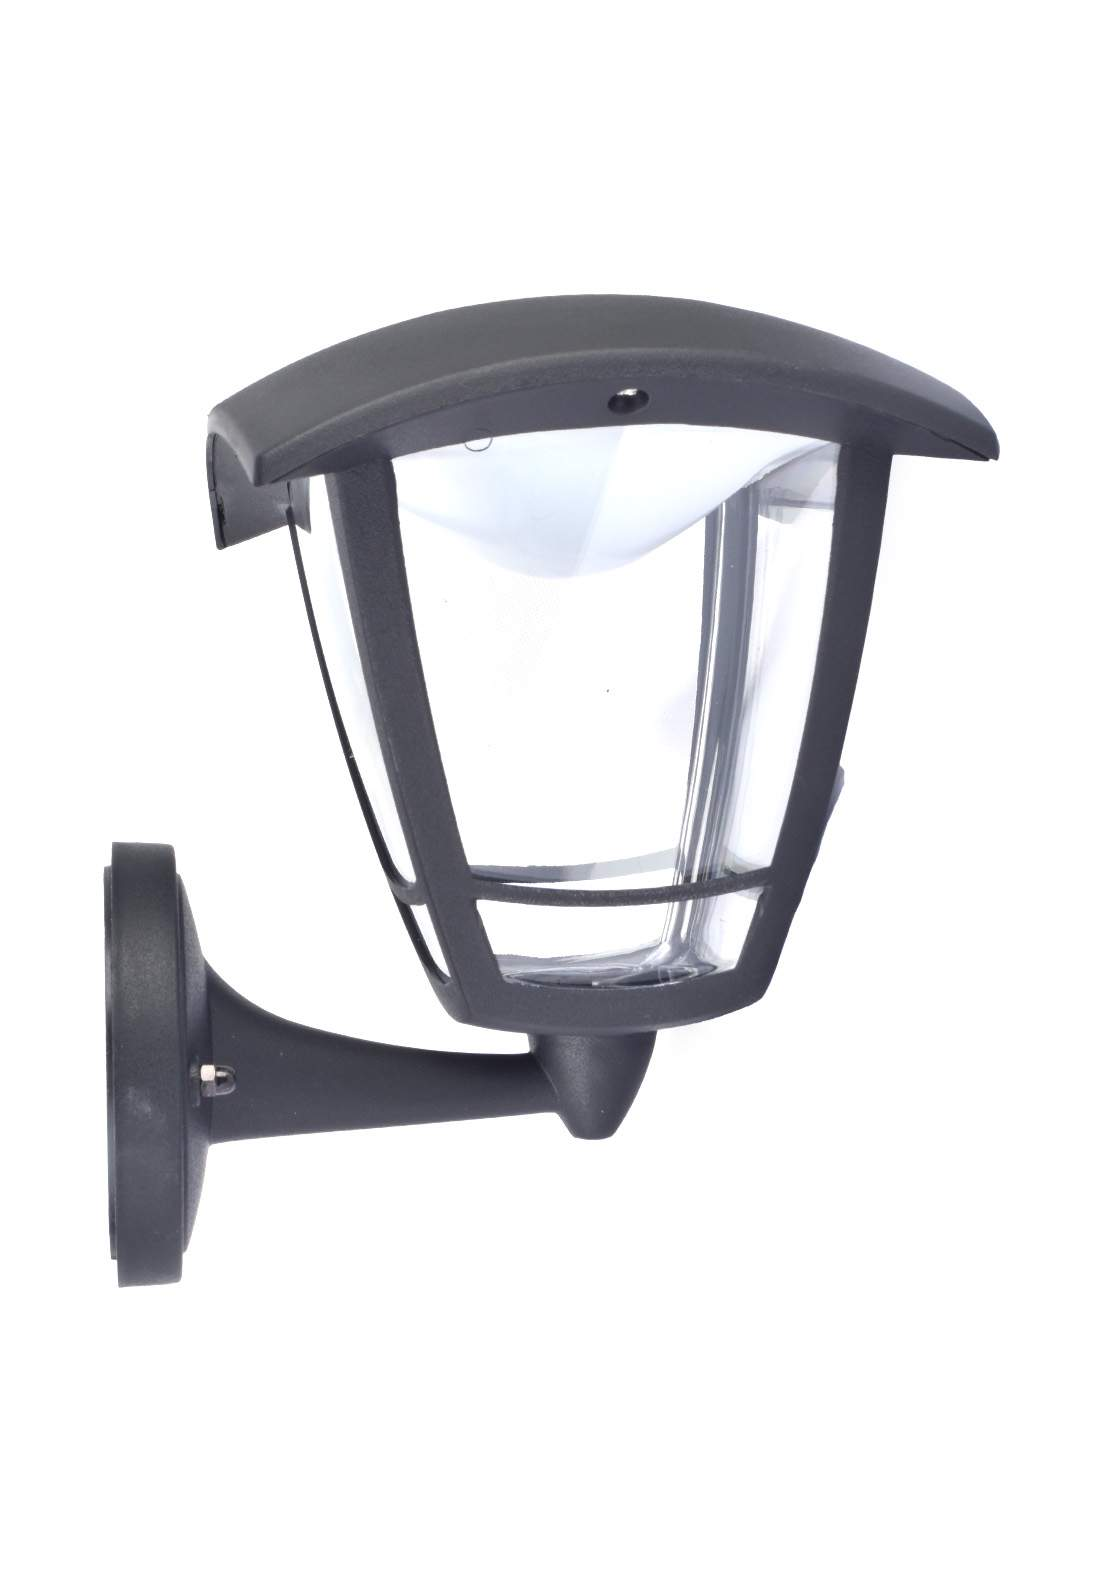 Luceco LEXCL4B6B4-01 Exterior Wall Light 8 Watt مصباح ليد خارجي